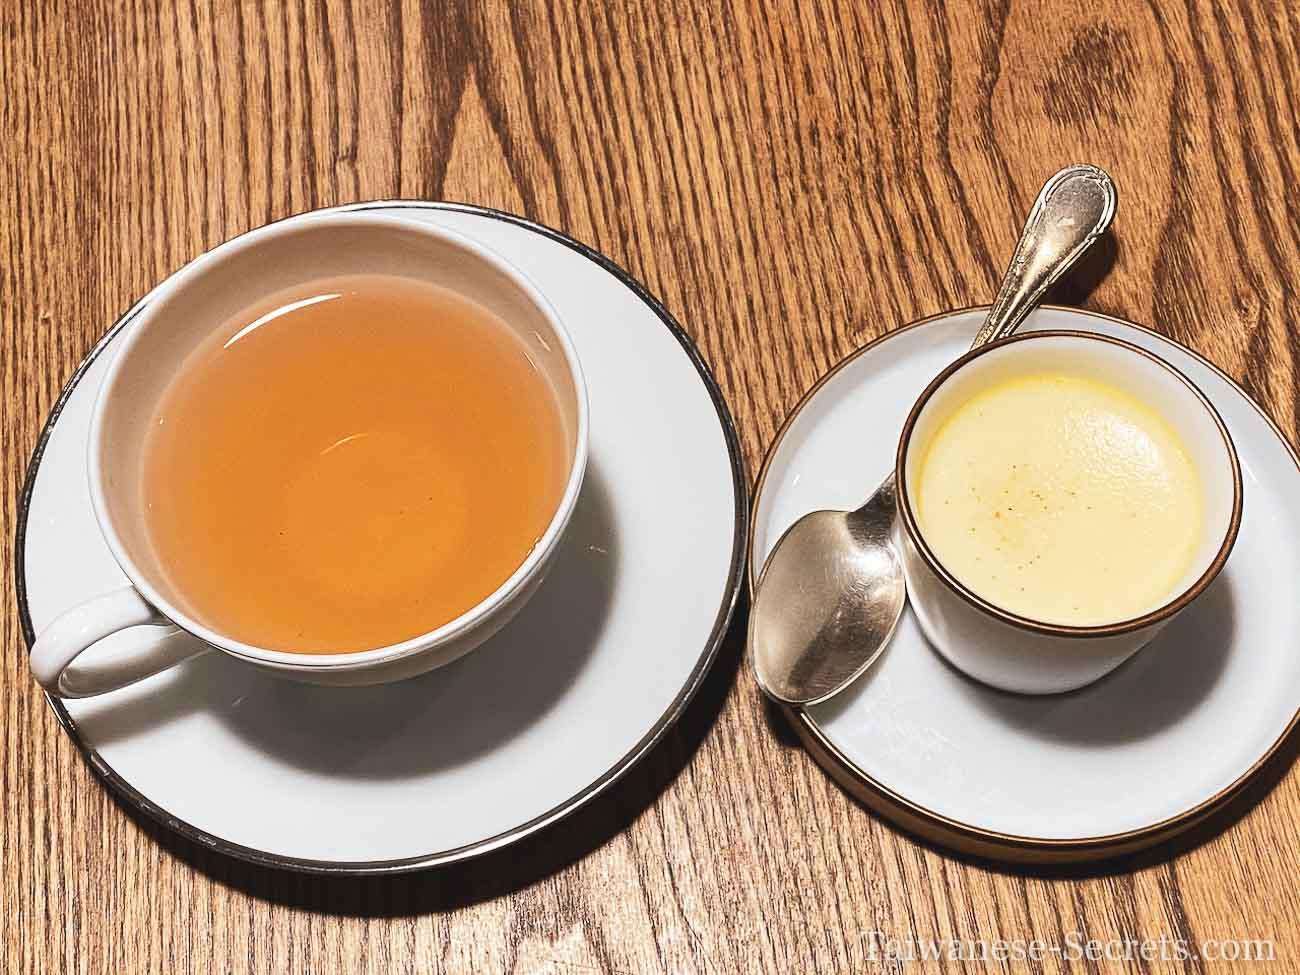 desert and tea